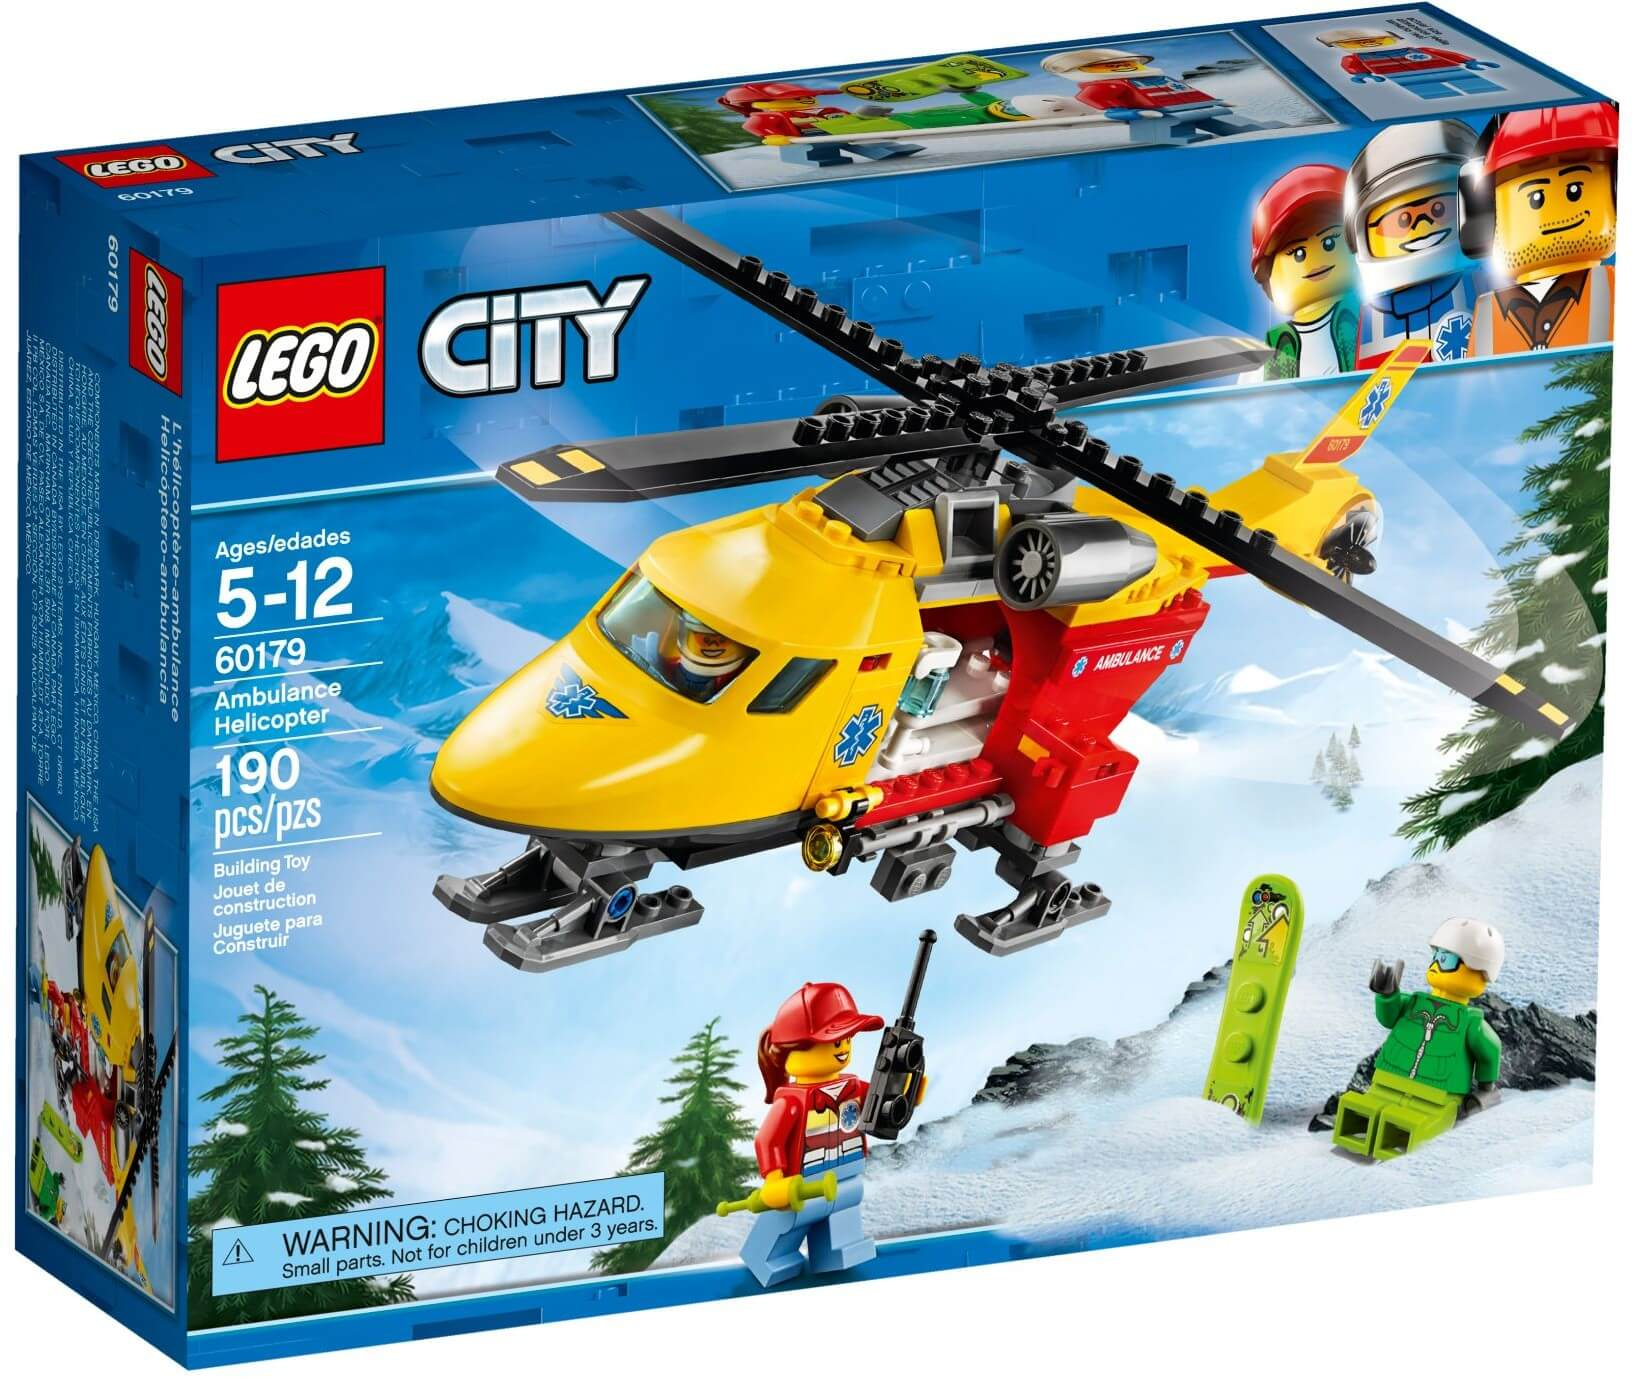 Mua đồ chơi LEGO 60179 - LEGO City 60179 - Trực Thăng Cứu Hộ (LEGO City 60179 Ambulance Helicopter)